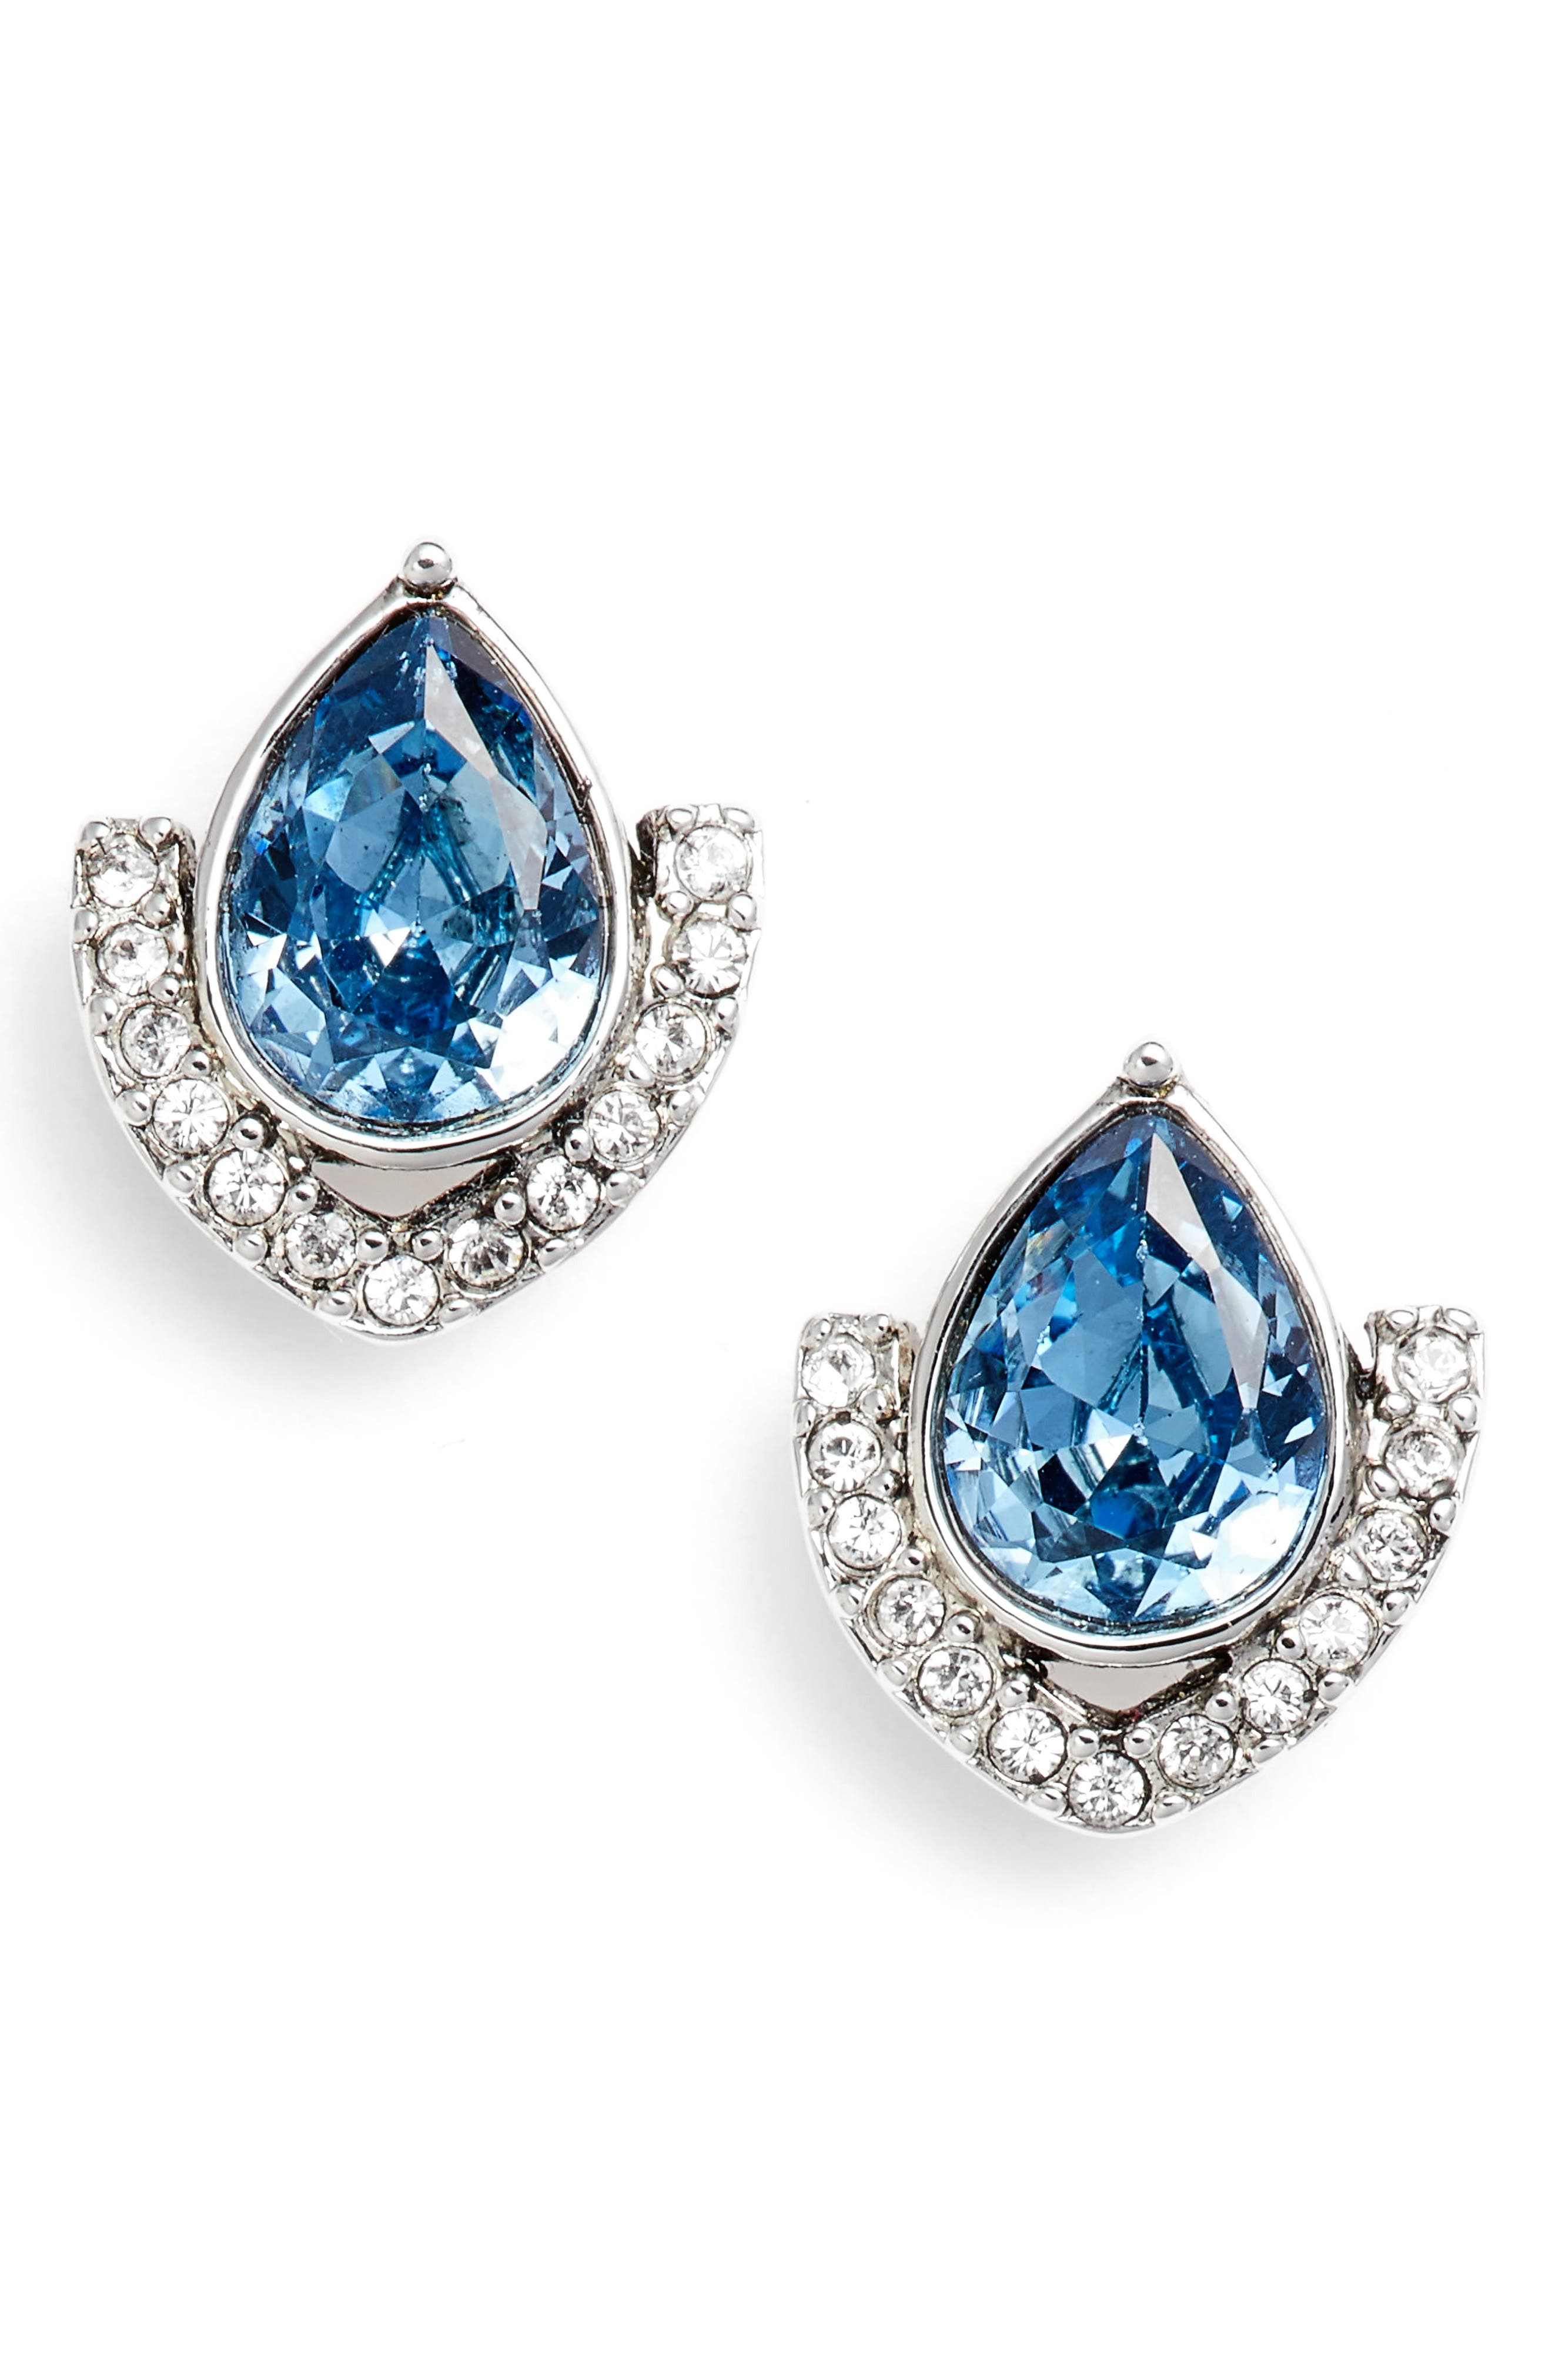 Main Image - Jenny Packham Stud Earrings